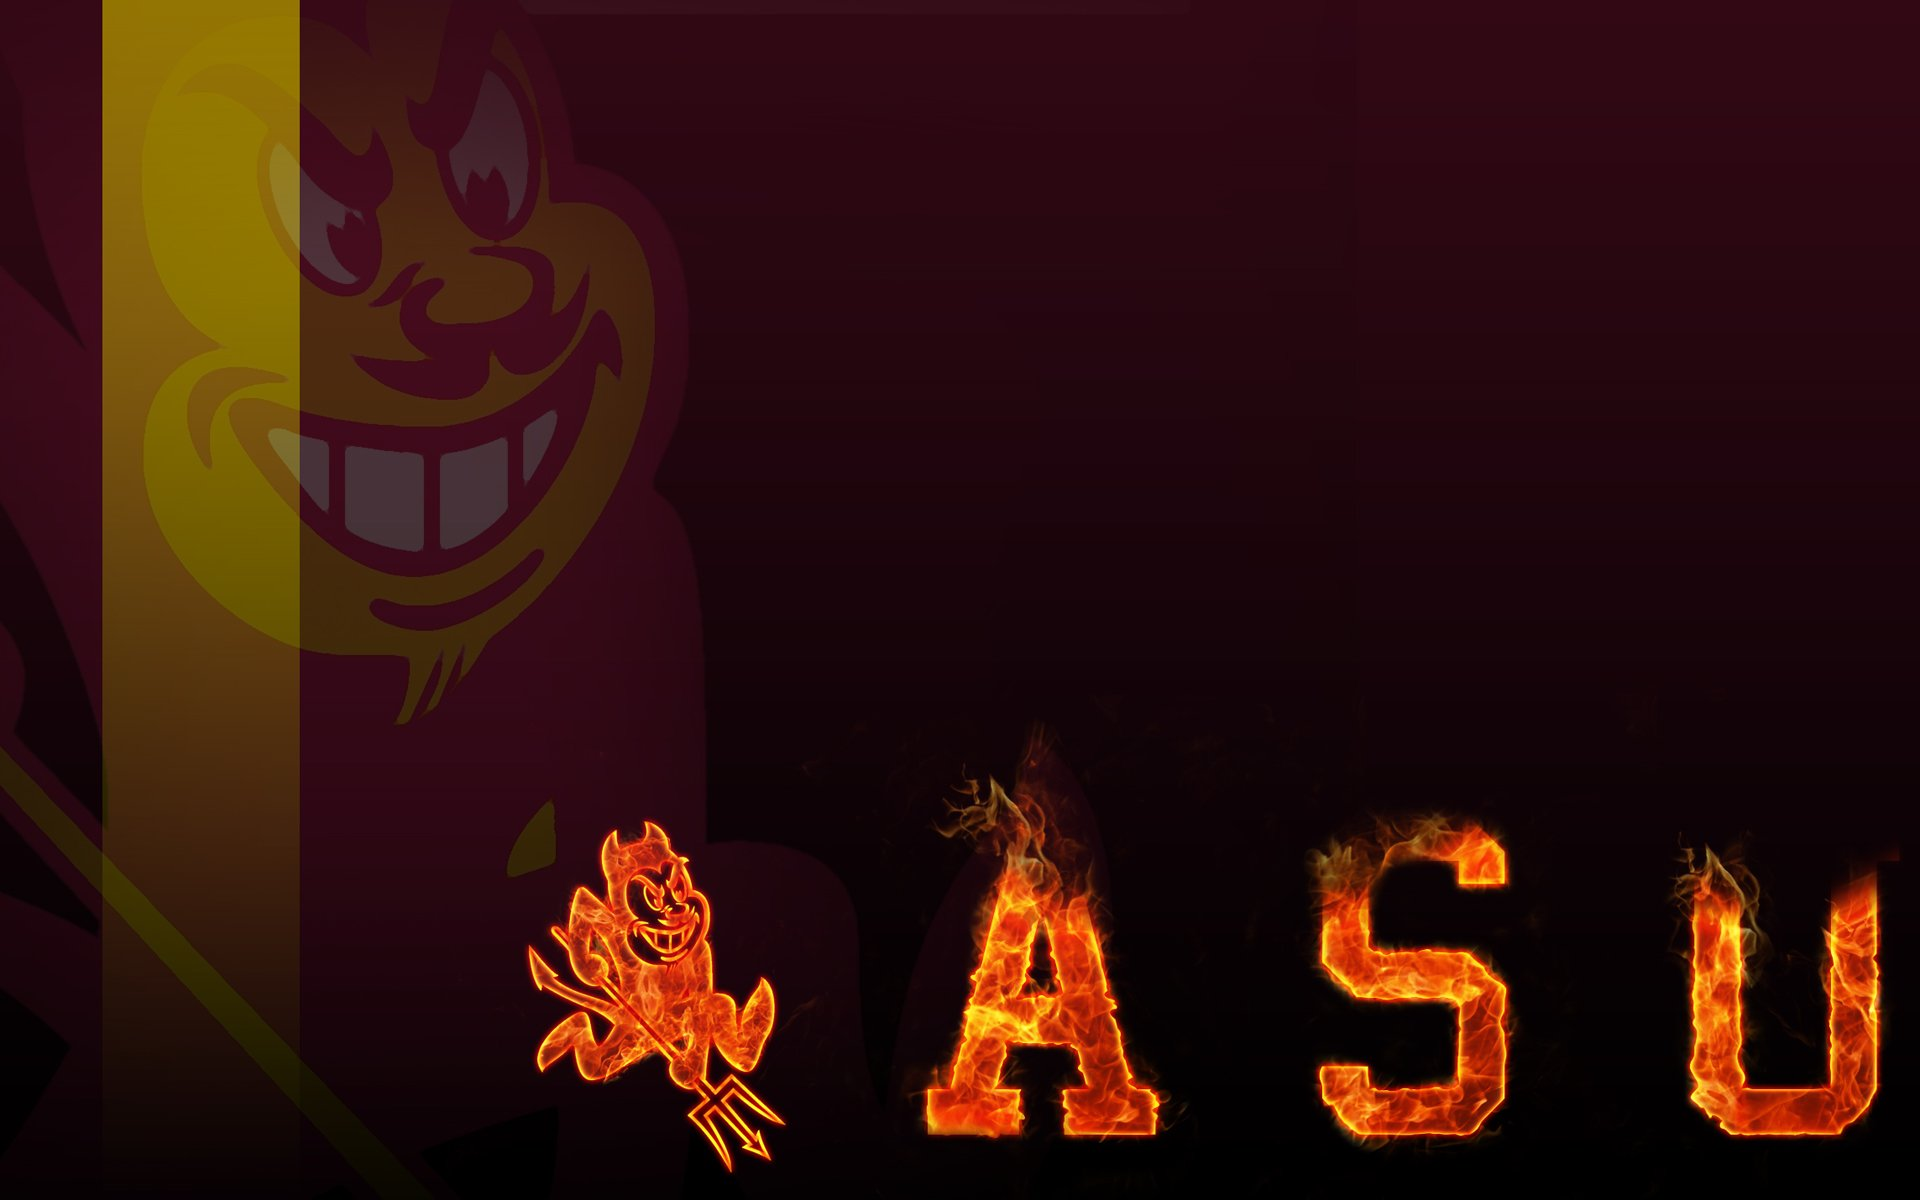 STATE SUN DEVILS college football 1sundevils wallpaper background 1920x1200